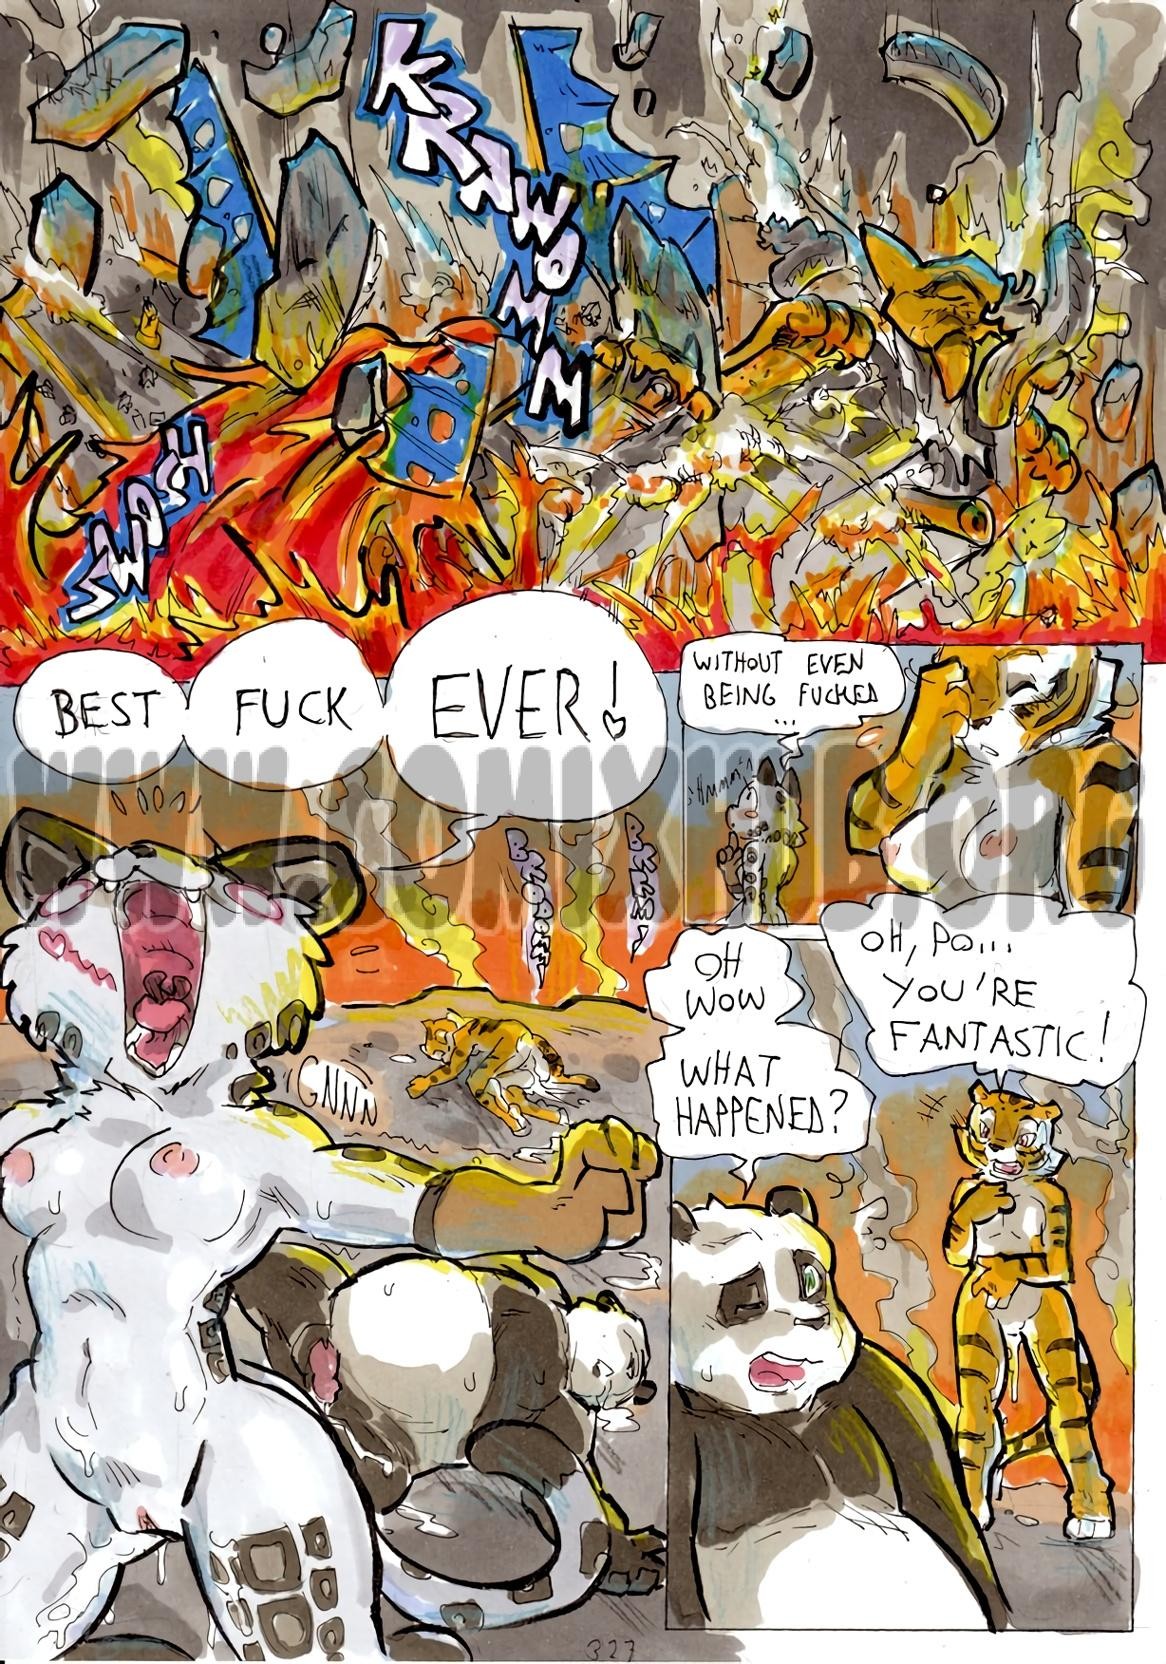 Better Late than Never 3 porn comics Oral sex, Anal Sex, Blowjob, Creampie, Cum Shots, Cum Swallow, cunnilingus, Deepthroat, Double Penetration, fingering, Furry, Gangbang, Group Sex, Lesbians, Masturbation, Sex Toys, Straight, Titfuck